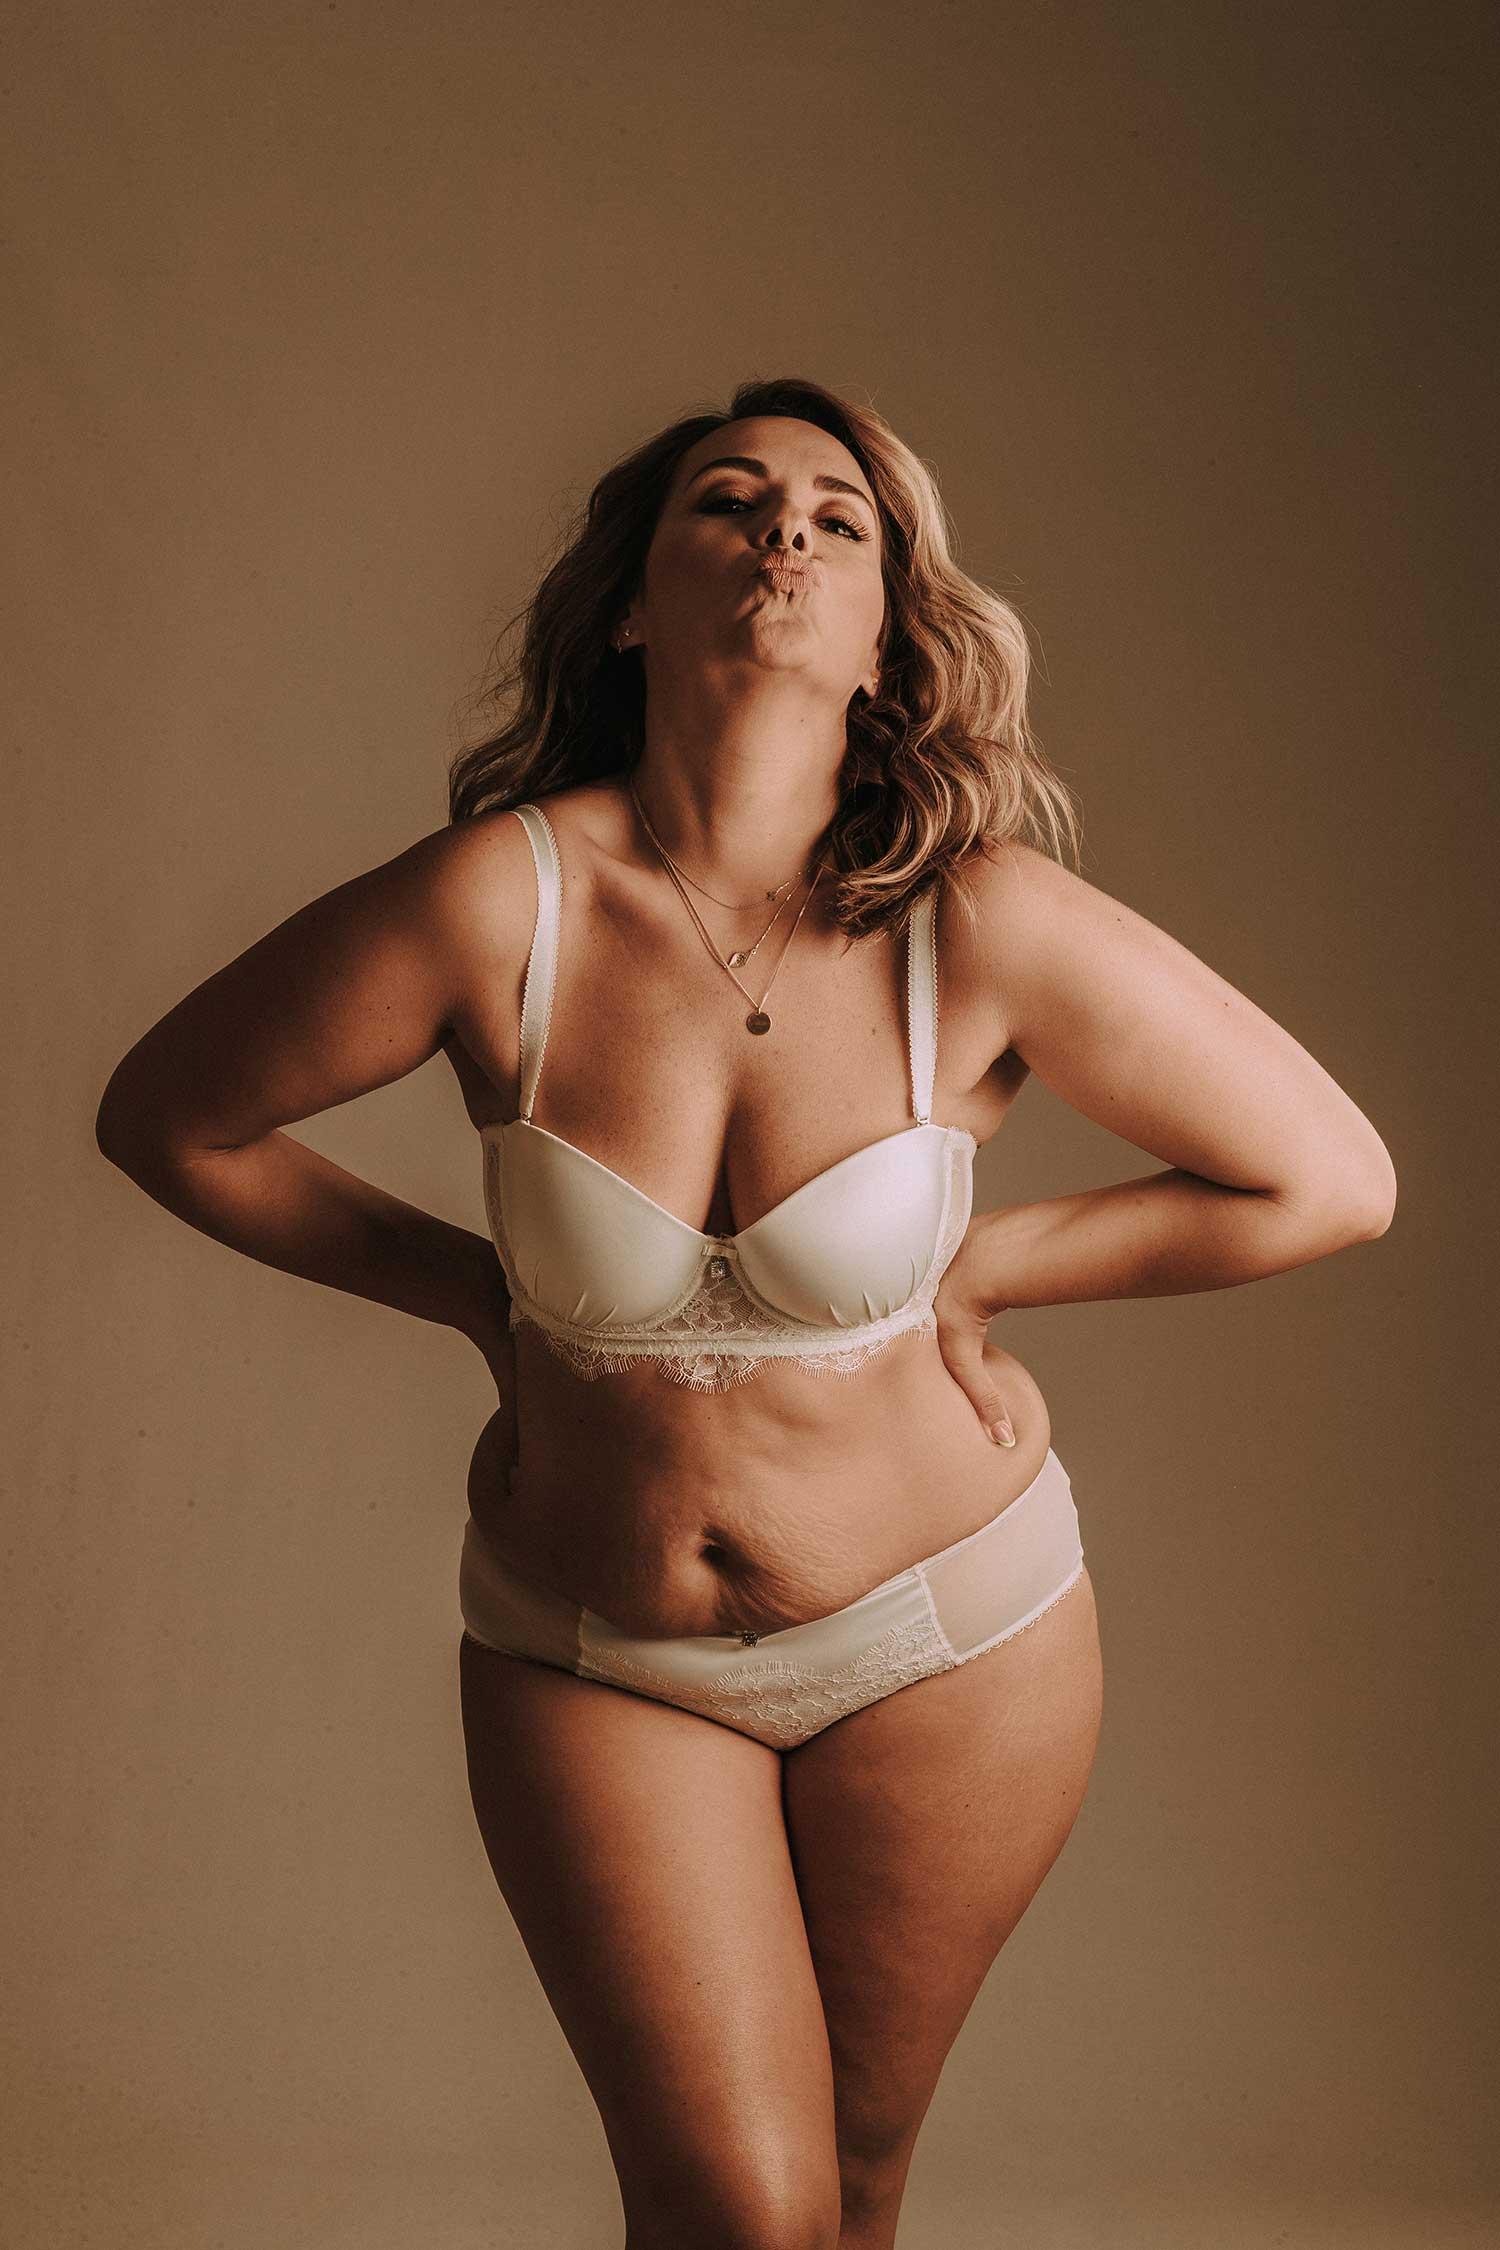 A girl loving her body